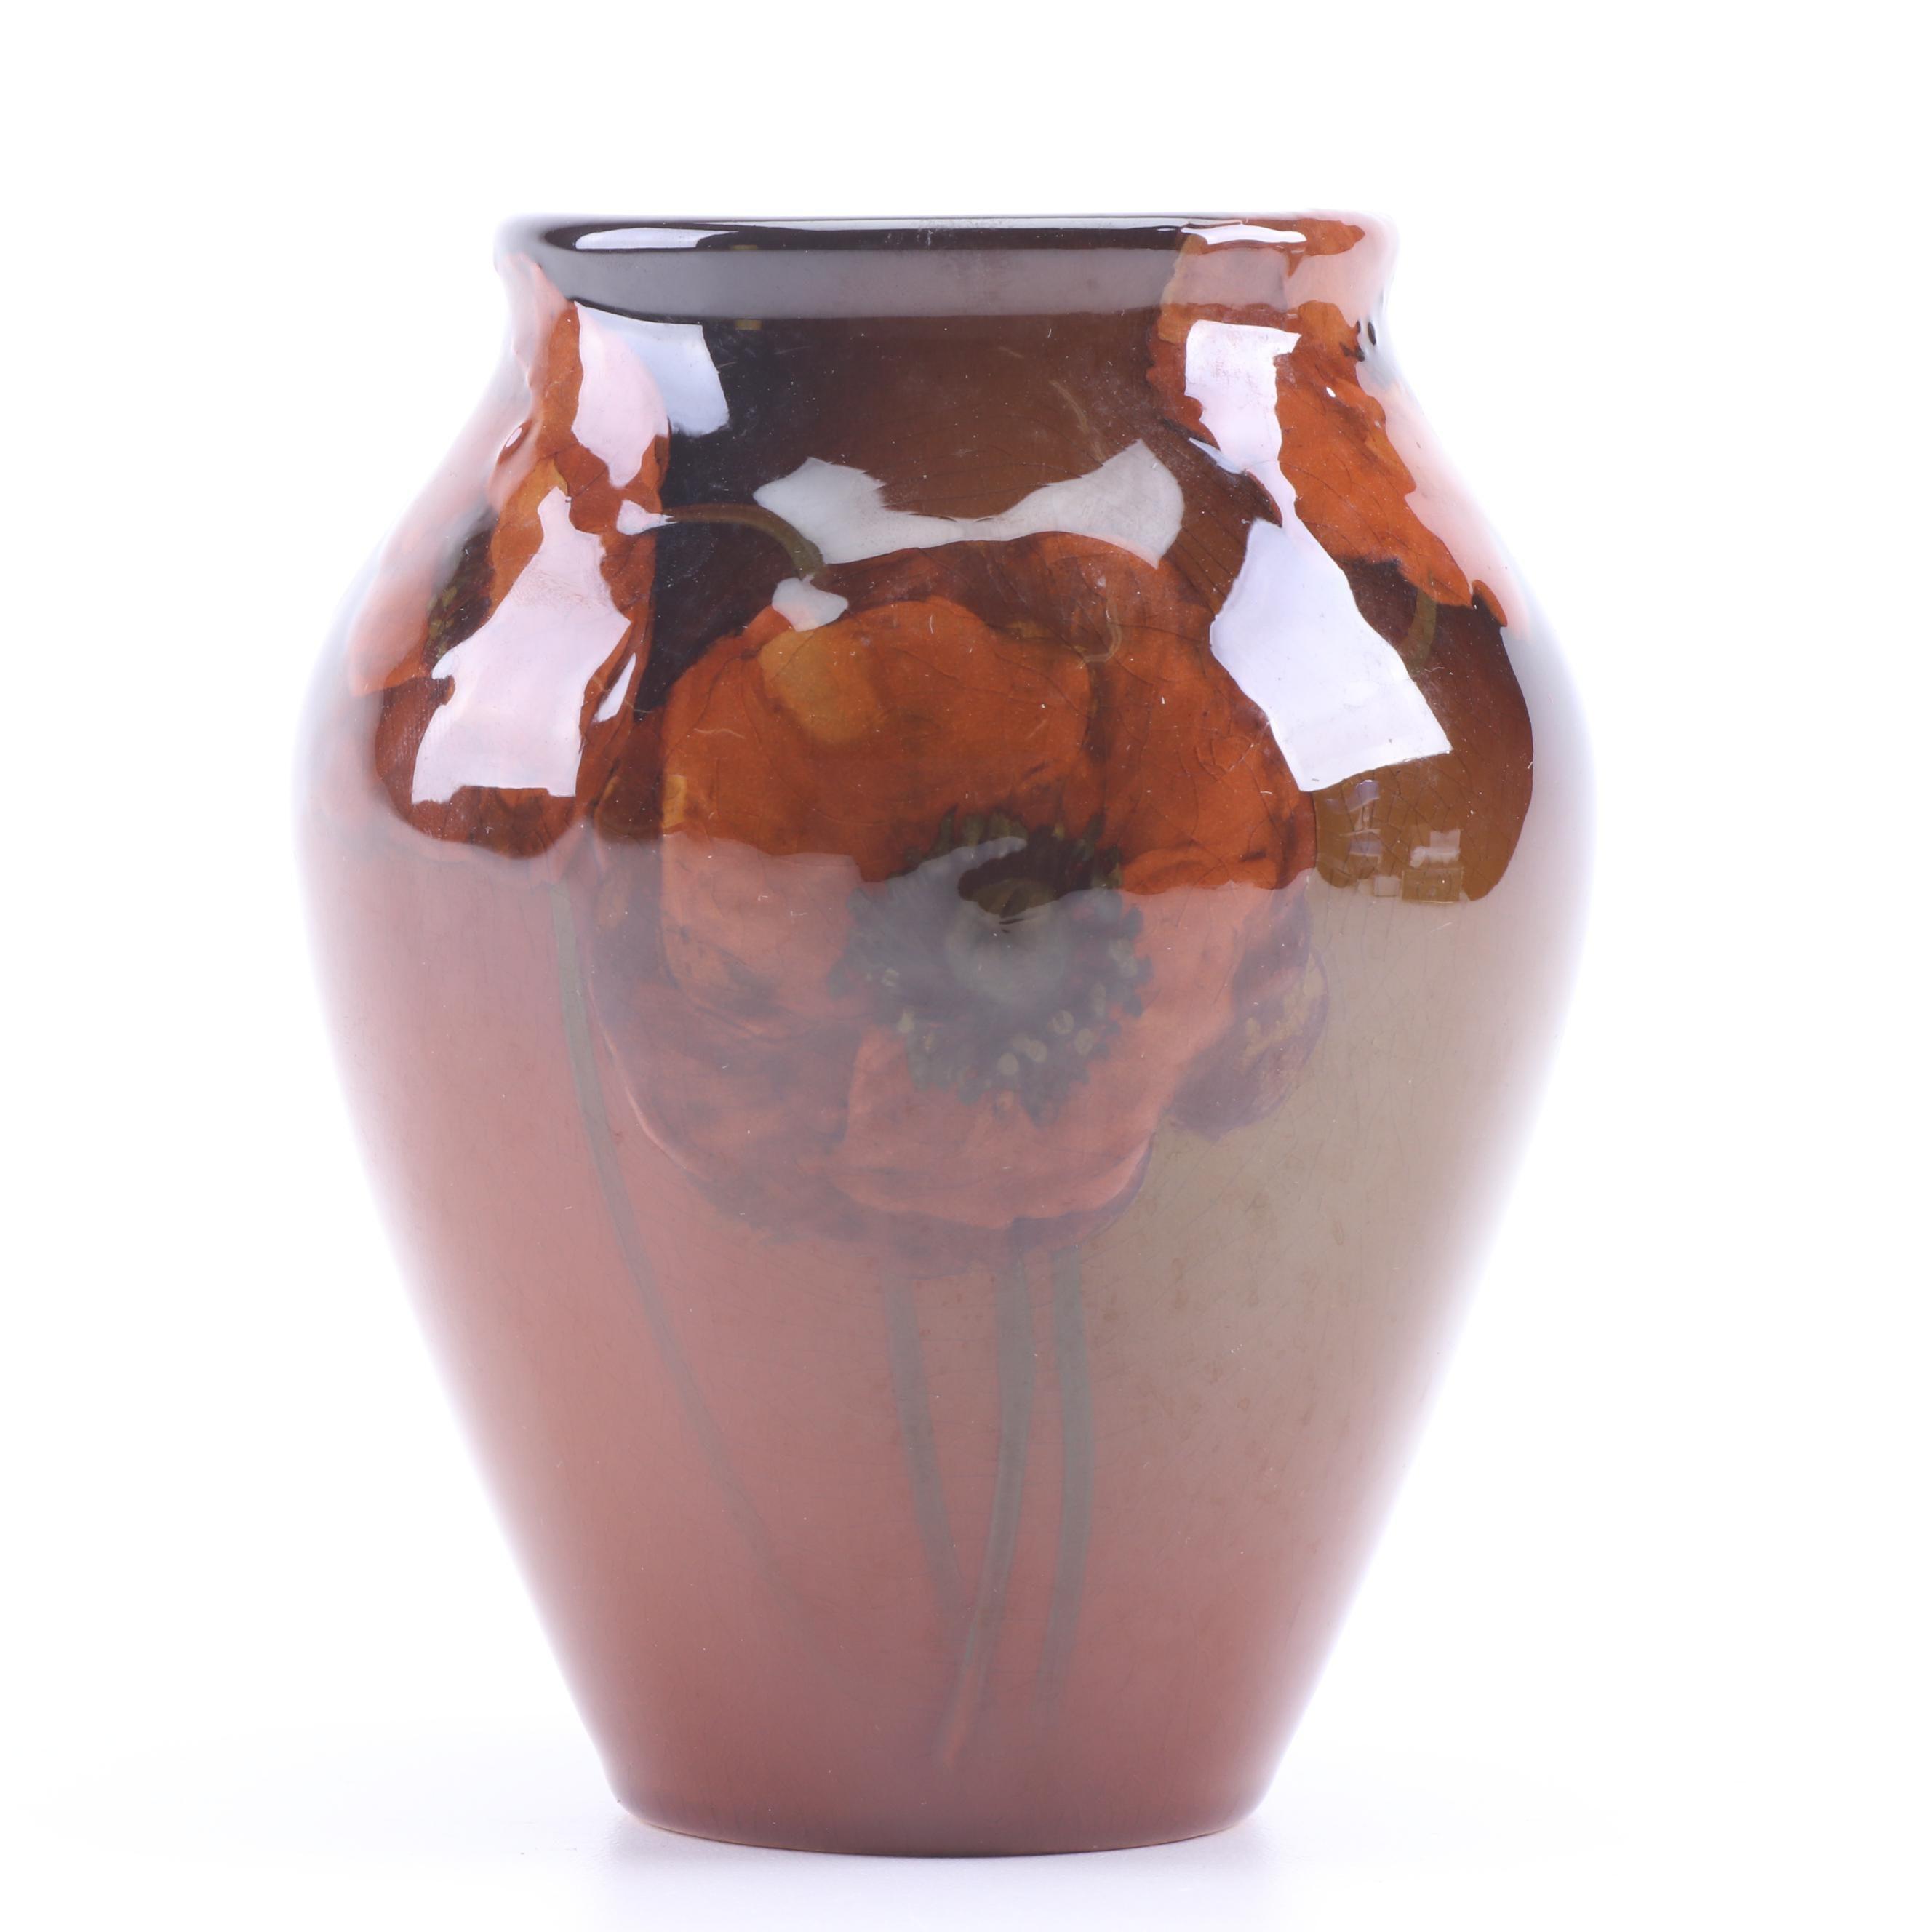 Rookwood Pottery Sallie Toohey Standard Glaze with Poppies Vase, circa 1903